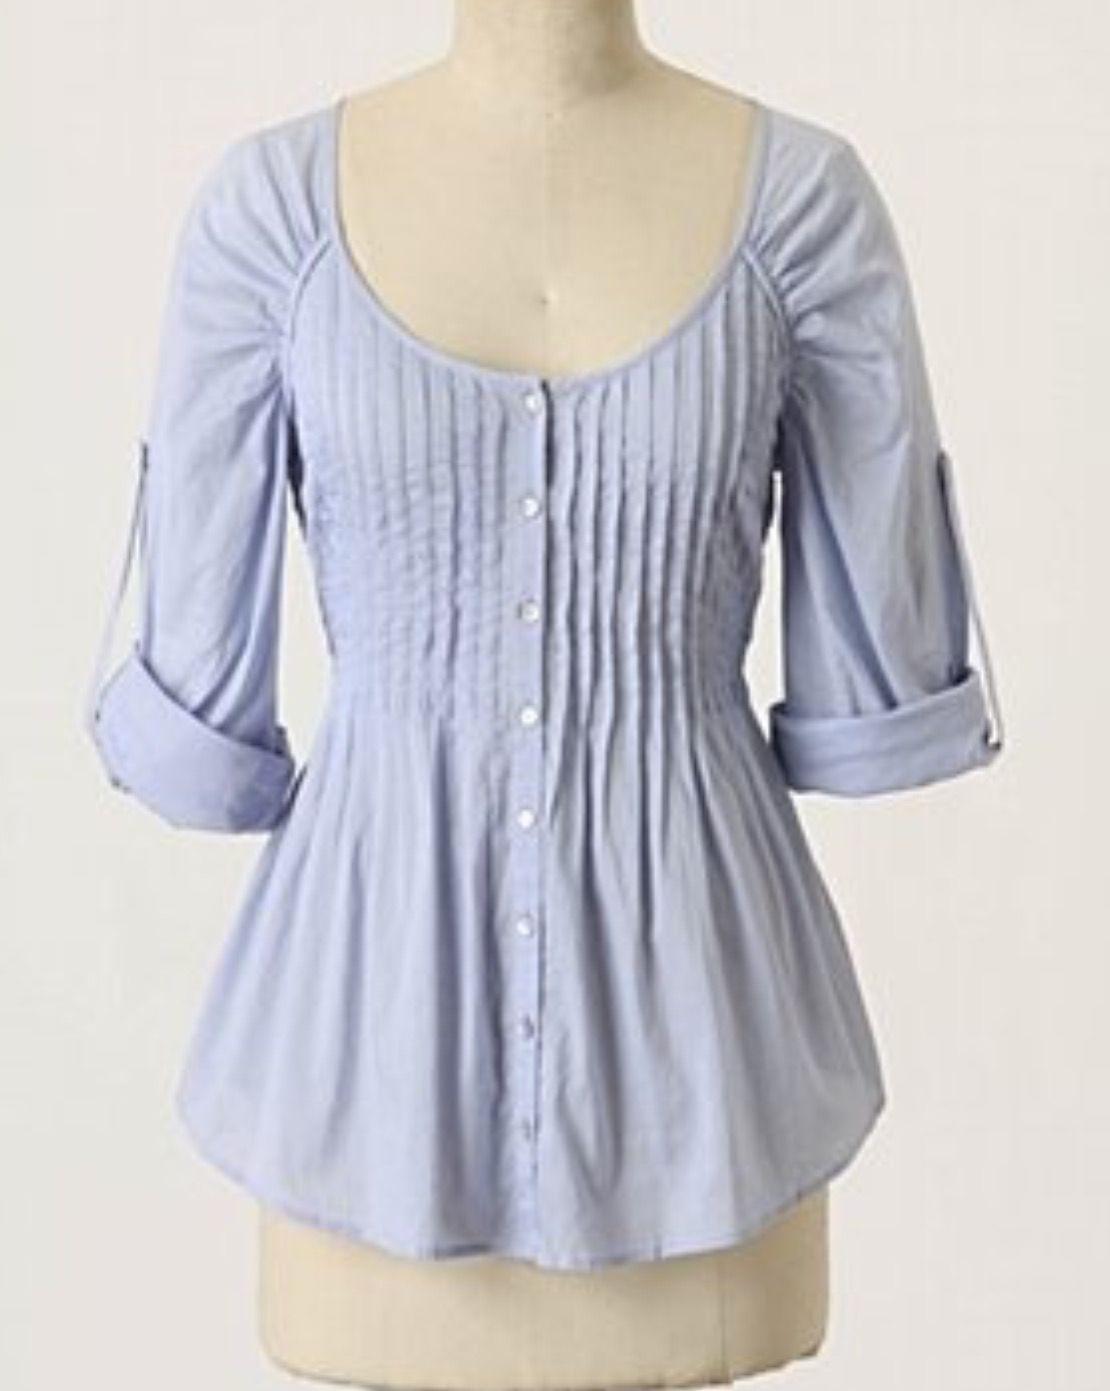 Переделка рубашки женской своими руками